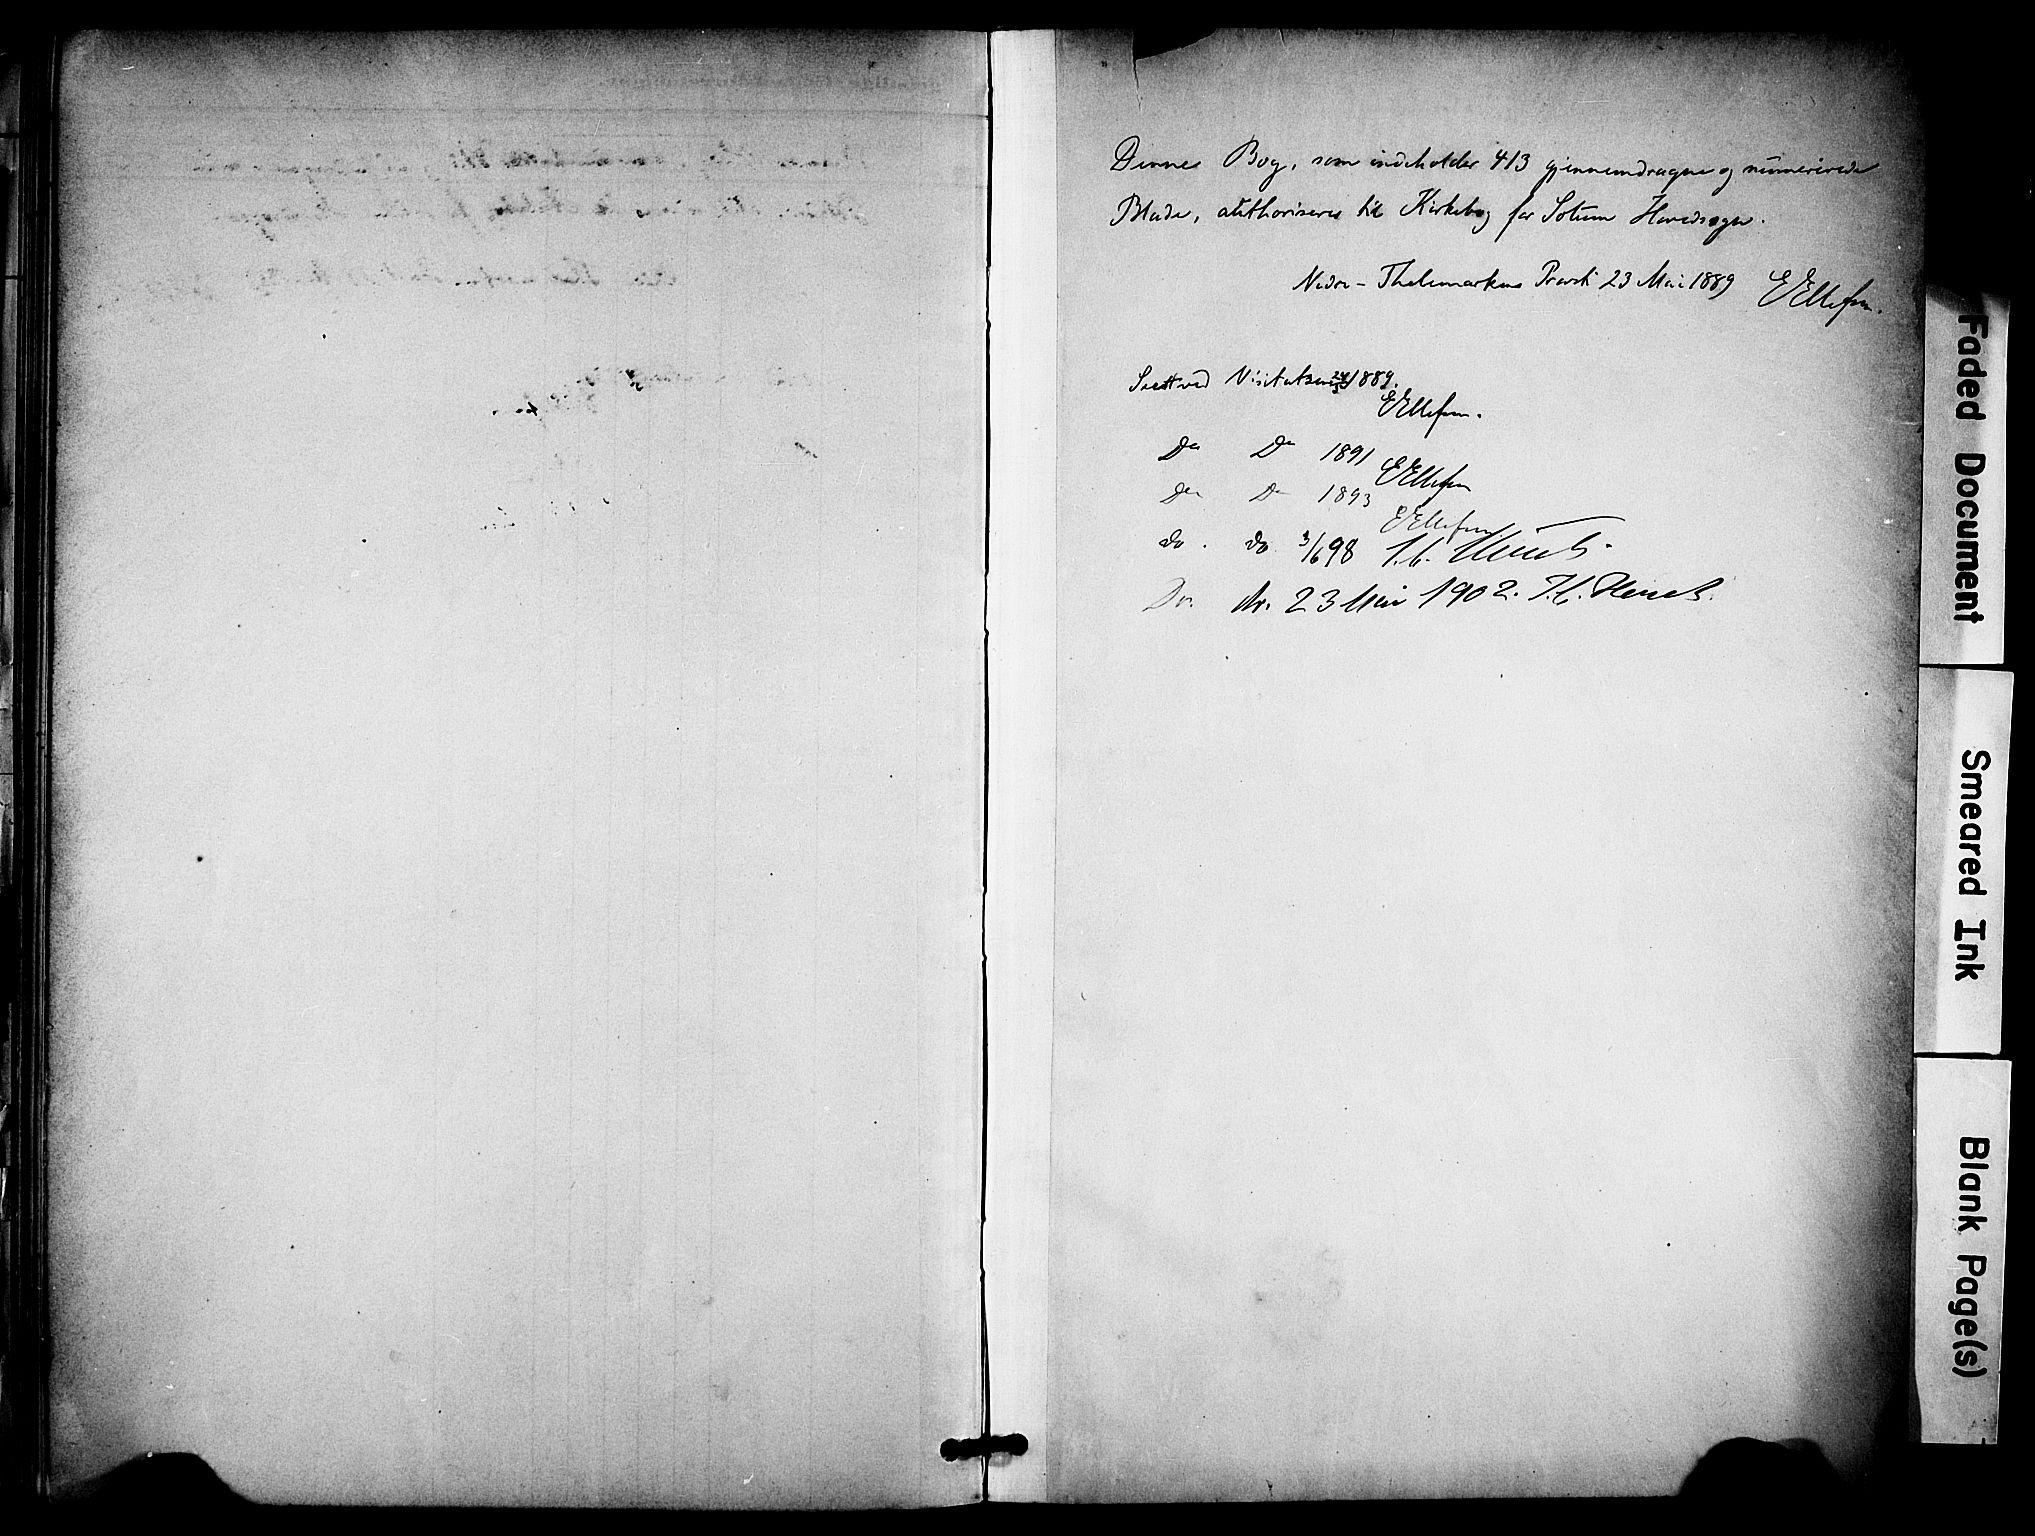 SAKO, Solum kirkebøker, F/Fa/L0010: Ministerialbok nr. I 10, 1888-1898